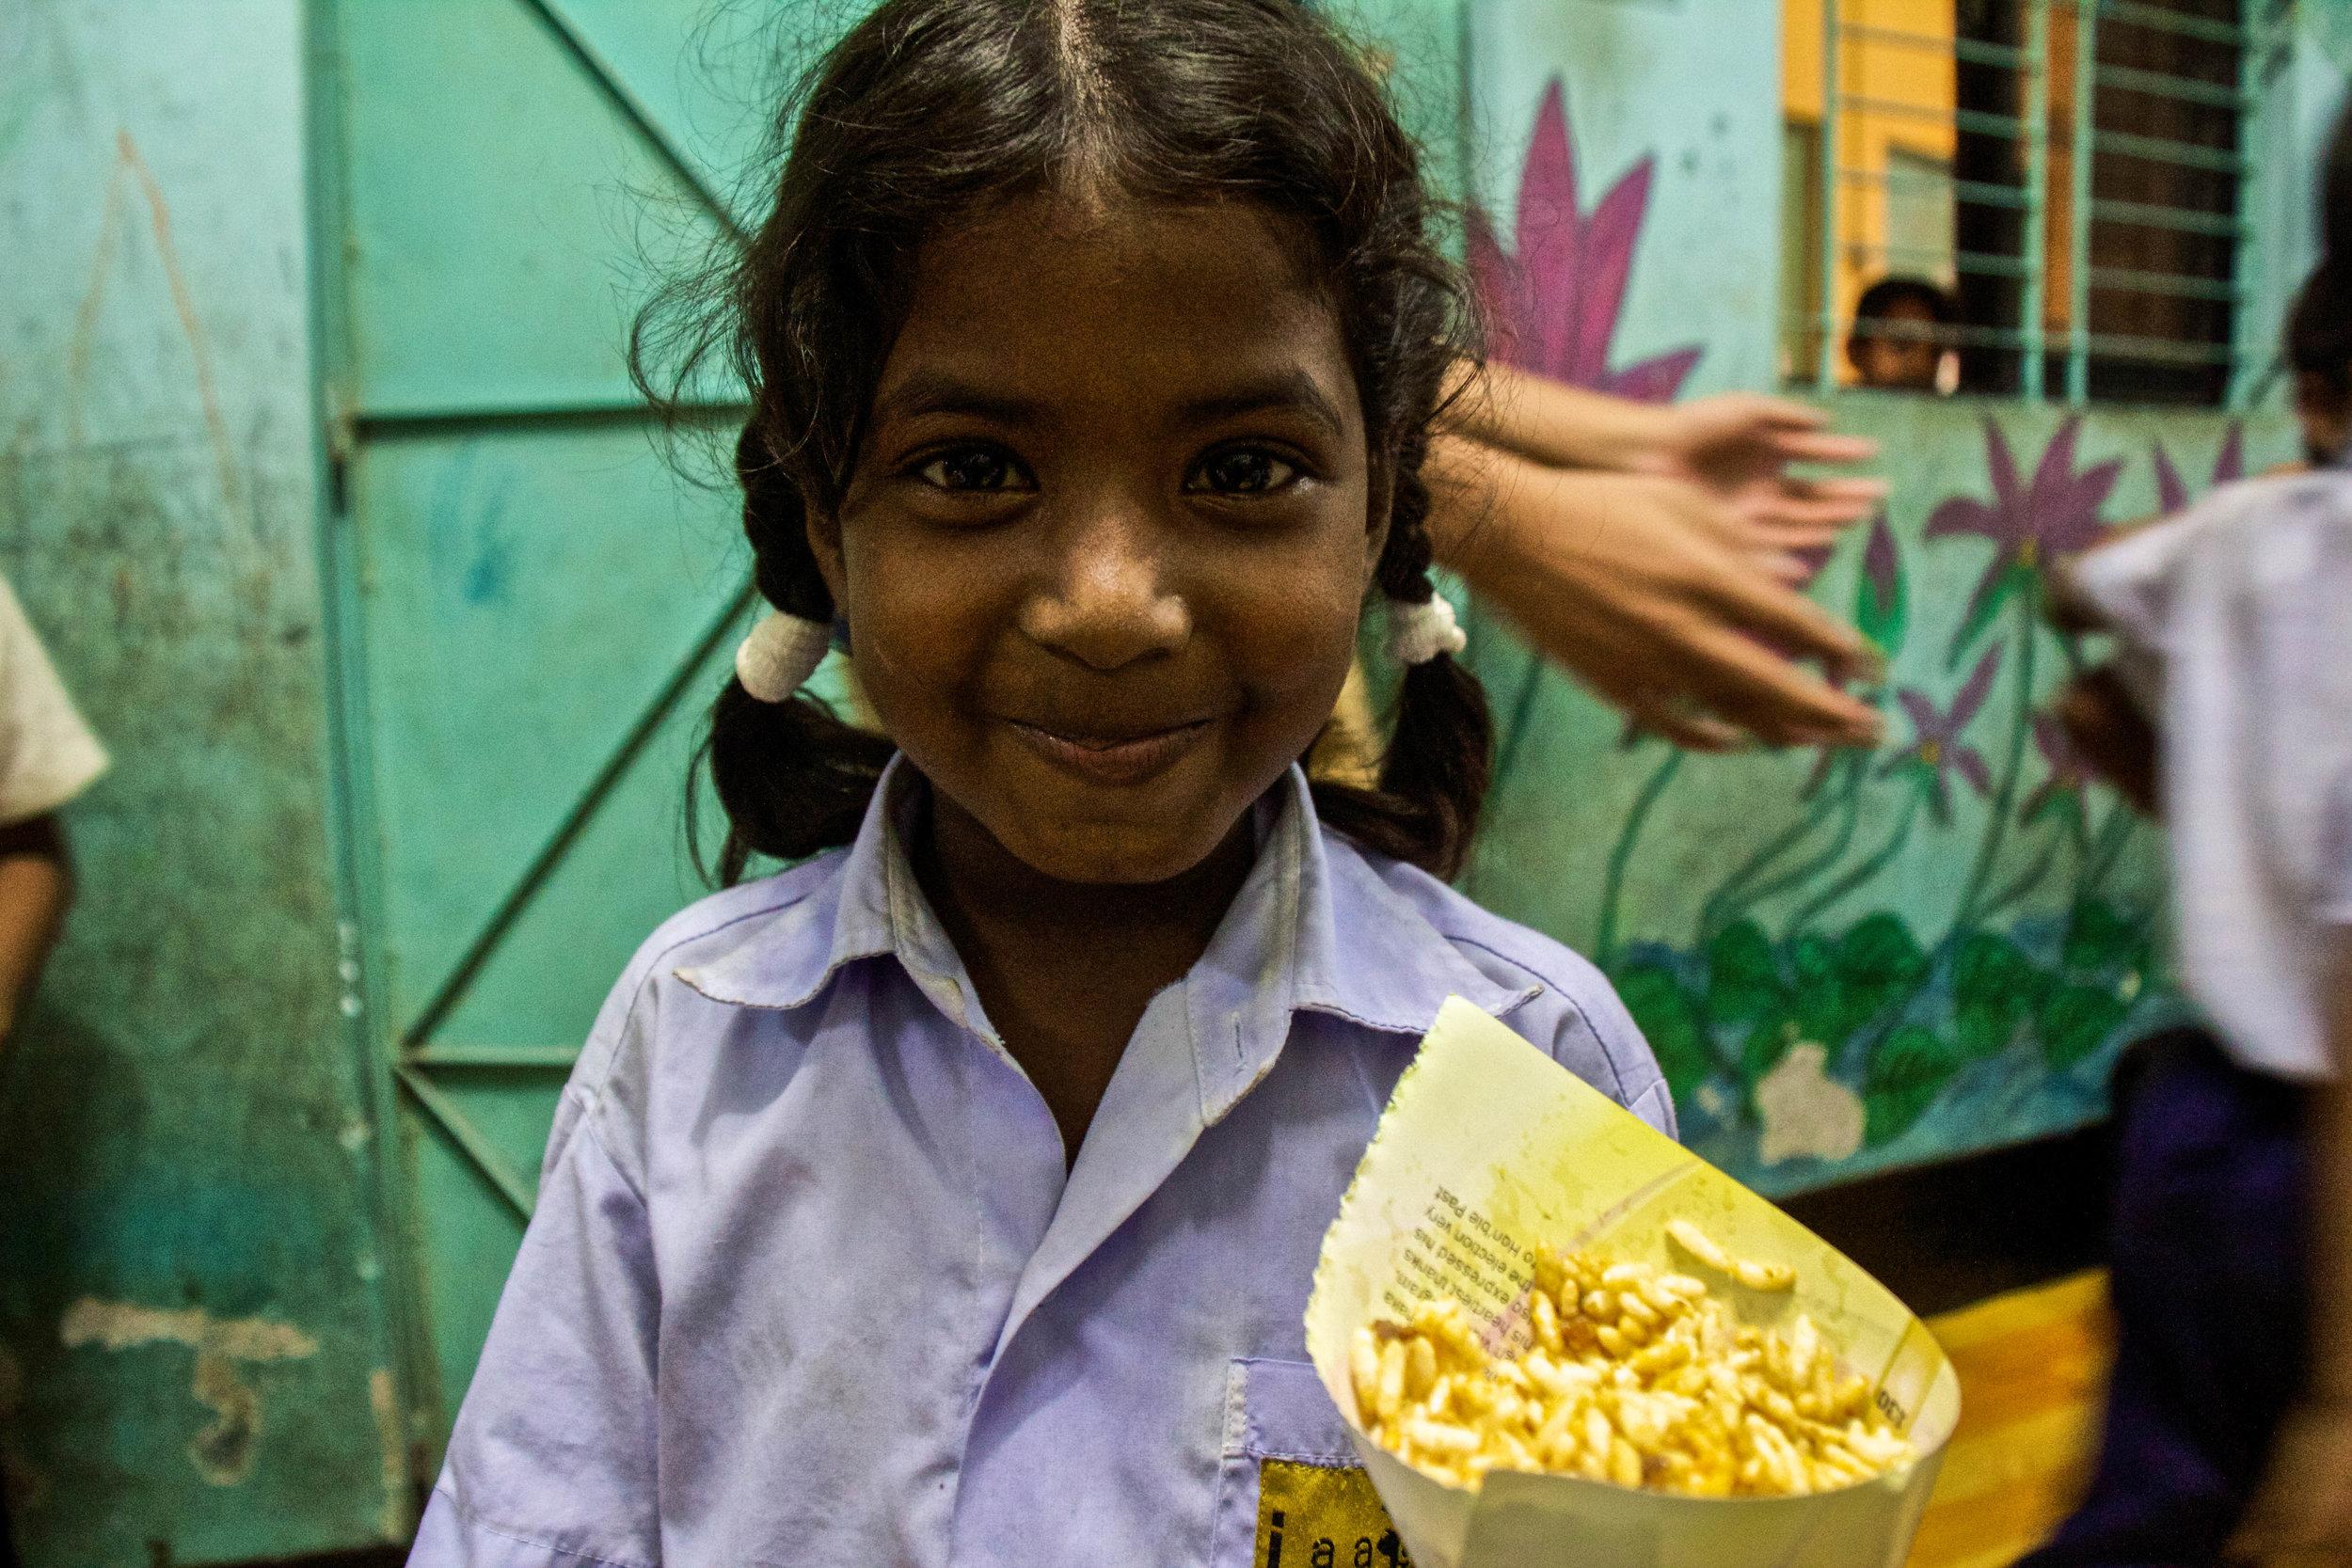 dhaka bangladesh jaago school children-47-27.jpg